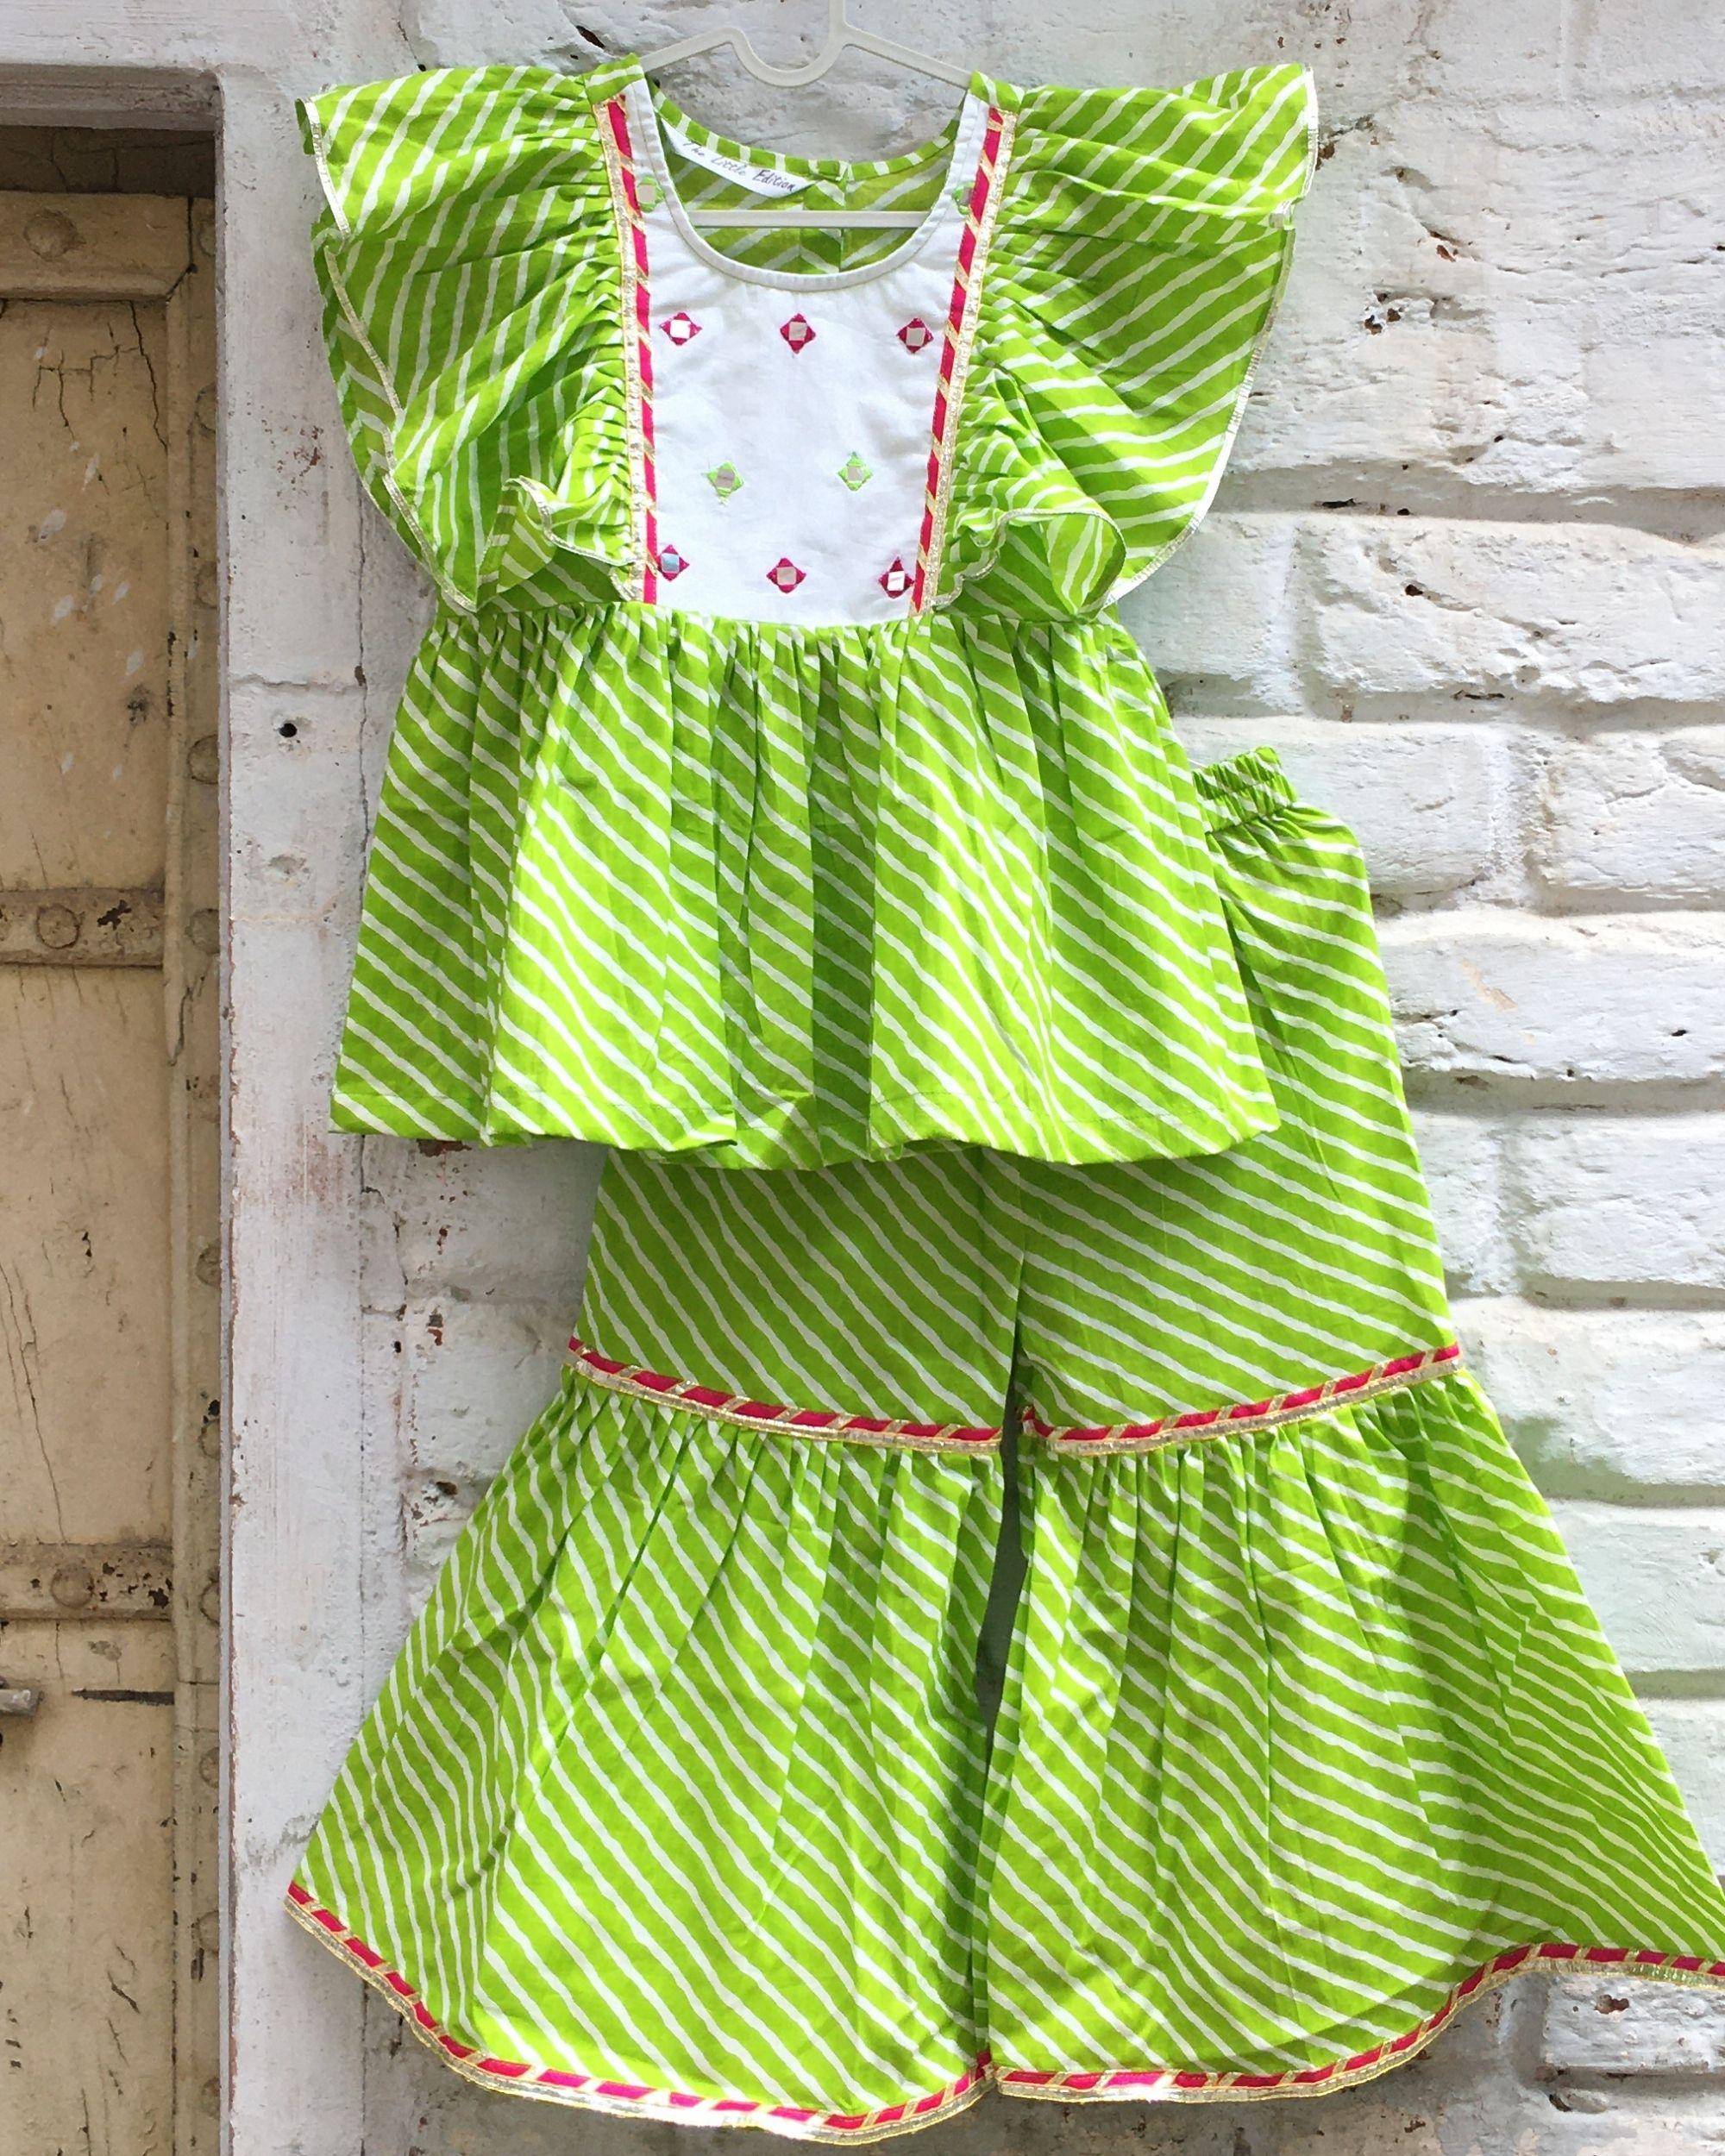 Lime green leheriya mirror work yoke kurta and lace detailed sharara - set of two